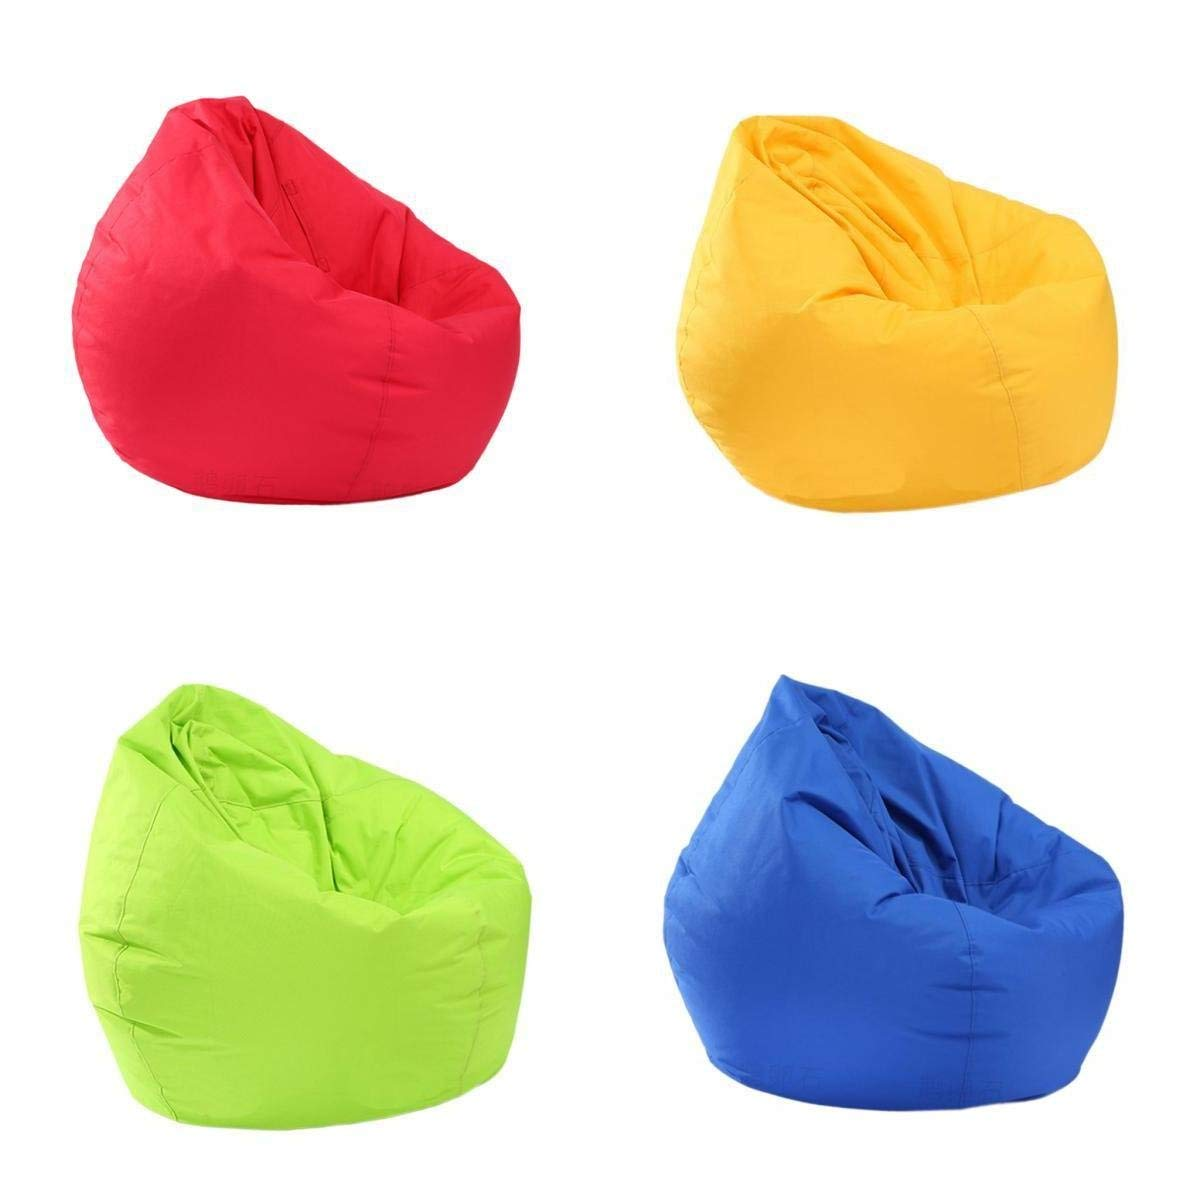 Refill for Pillows and Cushions 25 LB Dog Beds Bean Bag Chairs Jaxx Premium Grade Shredded Foam Filling